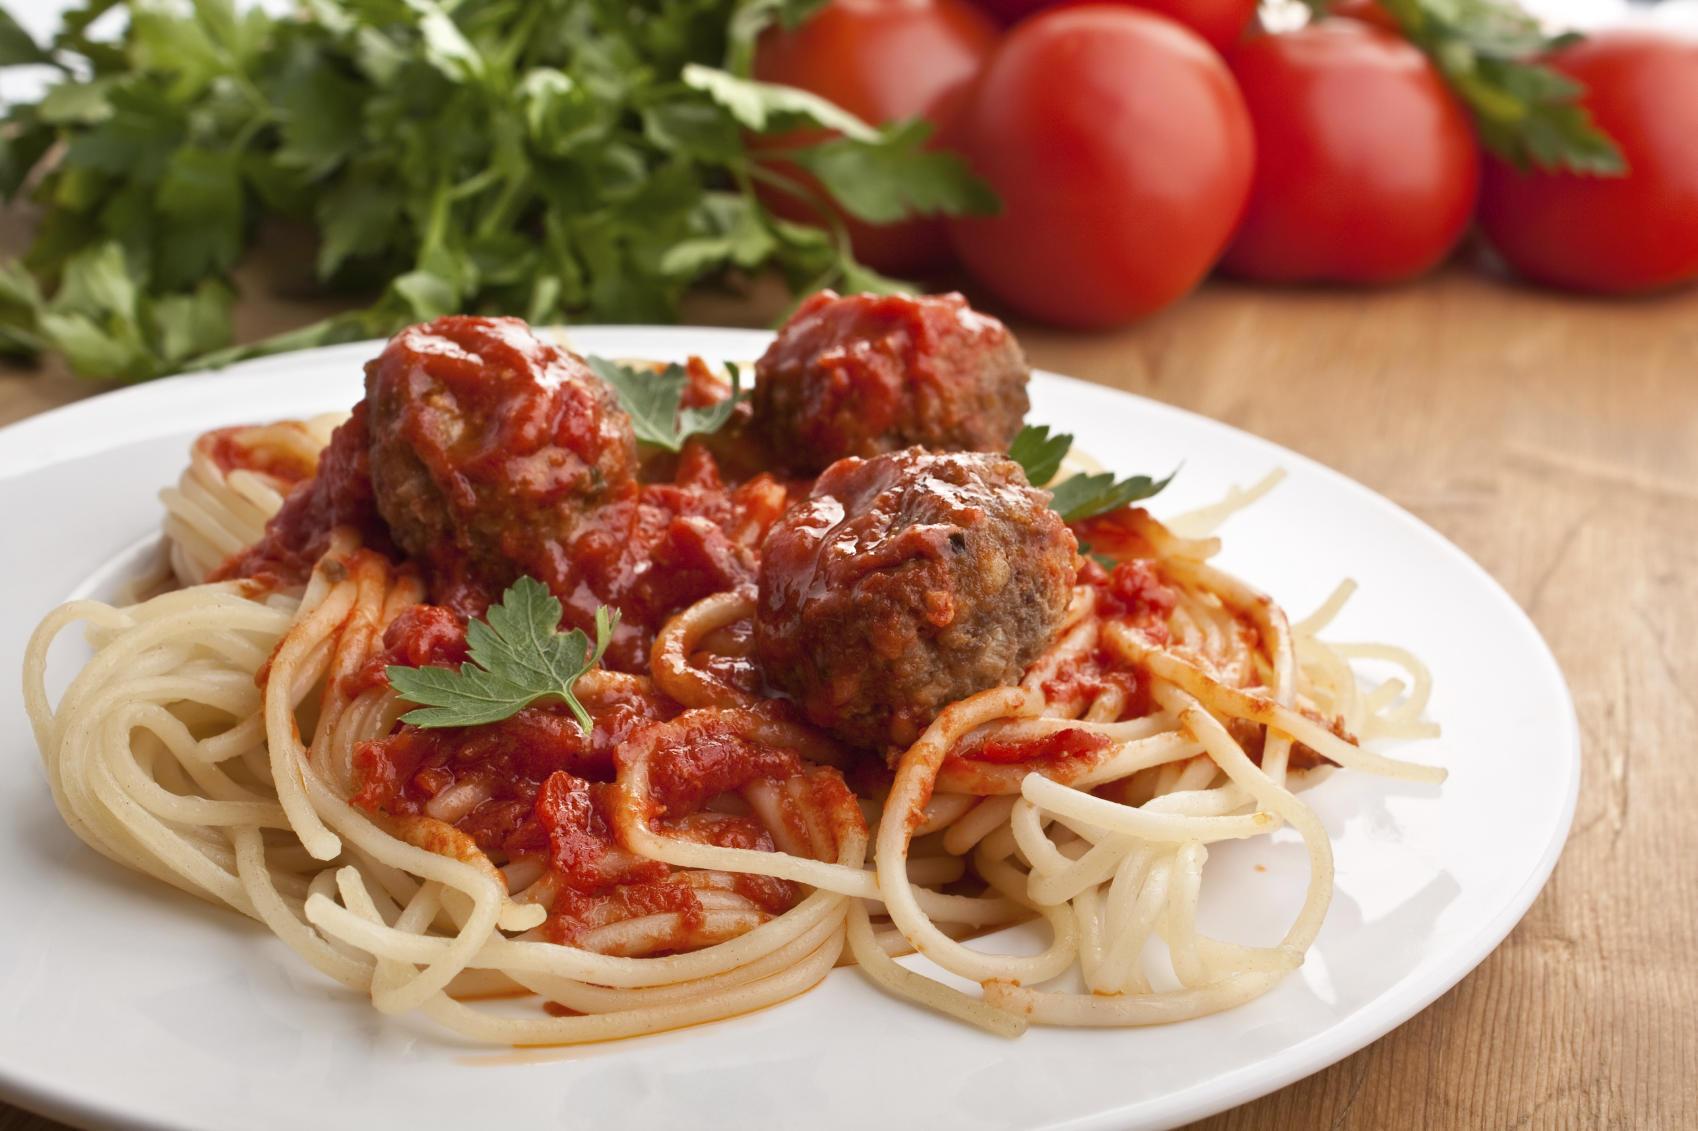 Bobby Flay's spaghetti and meatballs